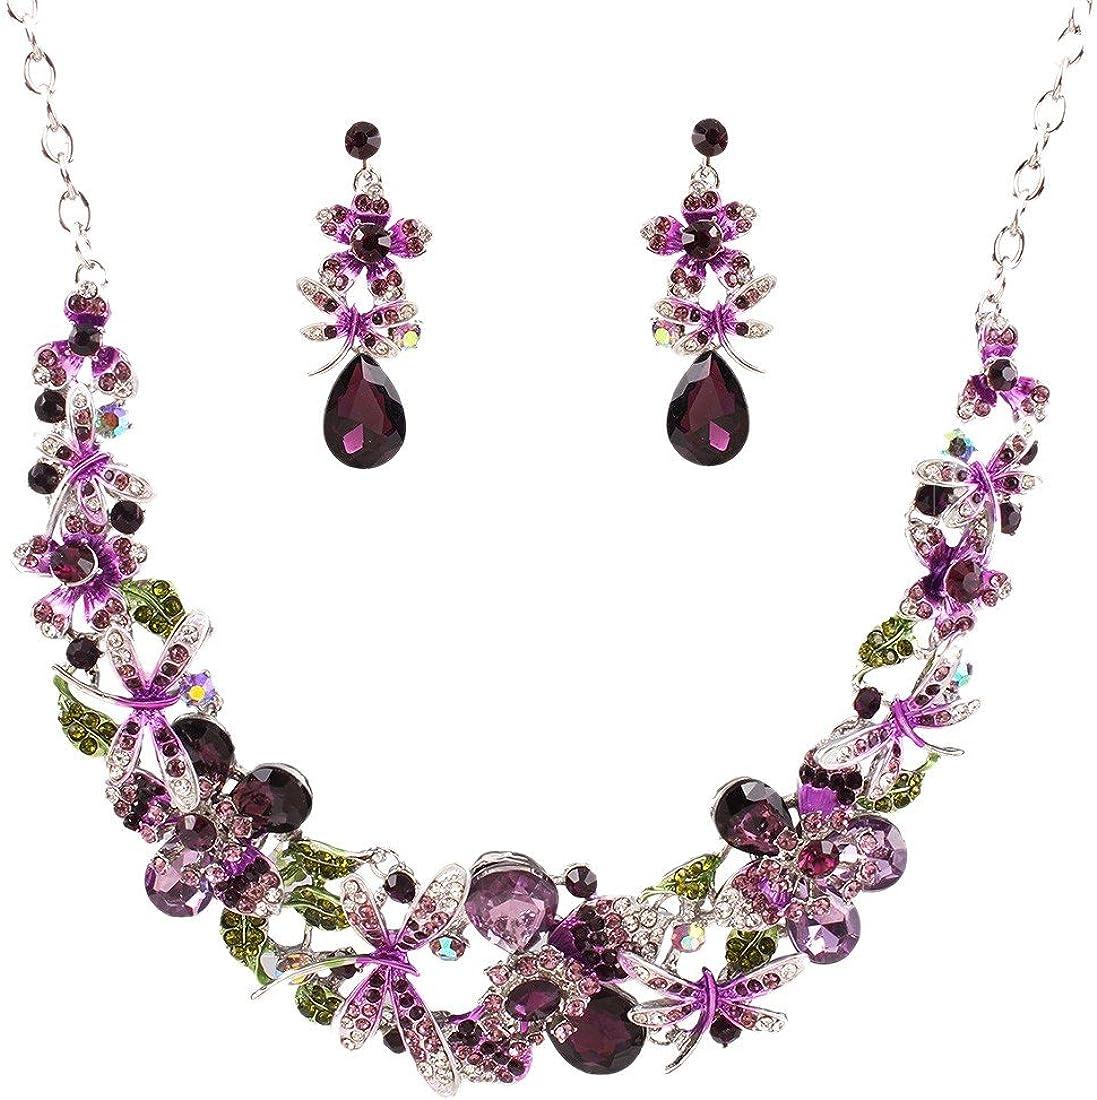 QIYUN.Z Cristal Cluster Perlas Mujeres Babero Flor Libelula Collar De Piedras Preciosas Aretes